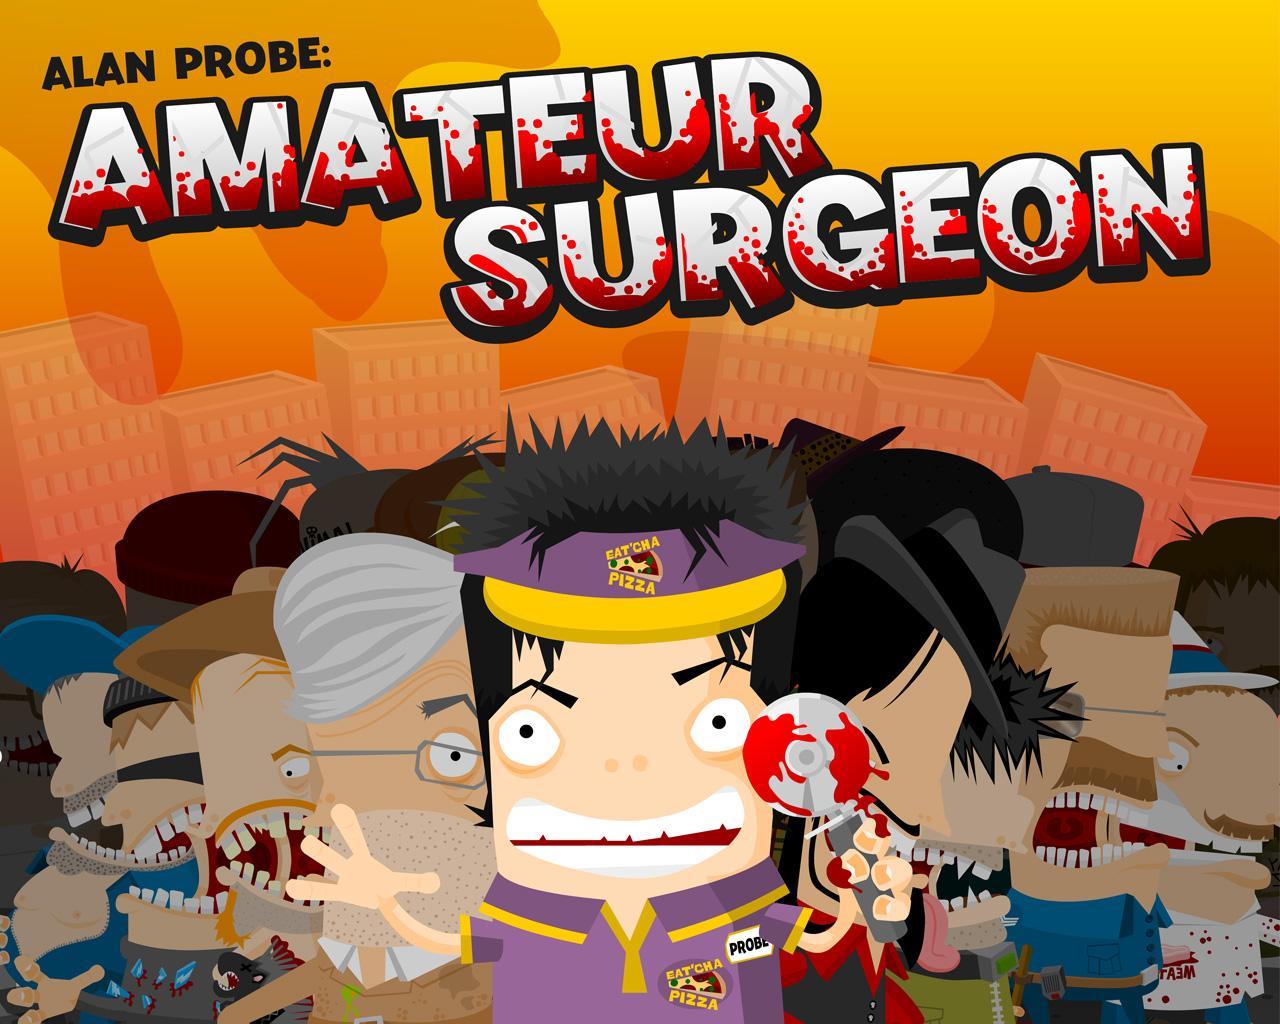 amateure surgeon